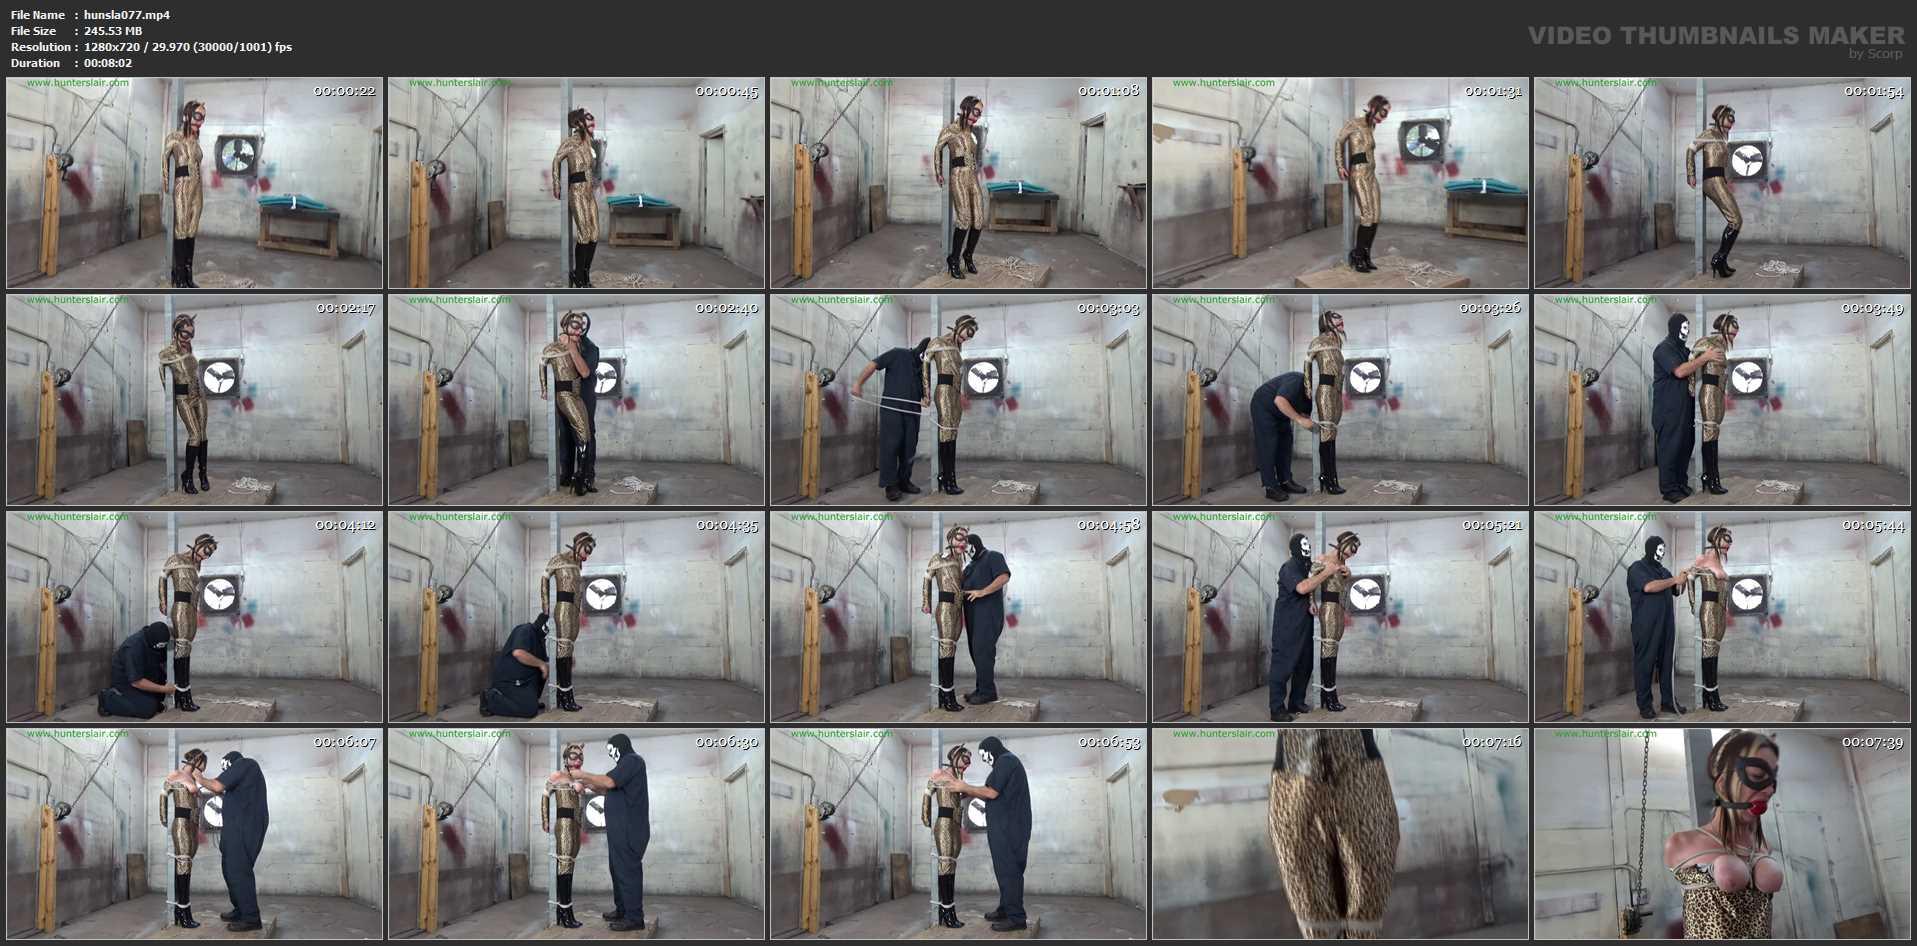 [HUNTERSLAIR] Jaguars brutal breast bound torments. Featuring: Lexi Lane [HD][720p][MP4]